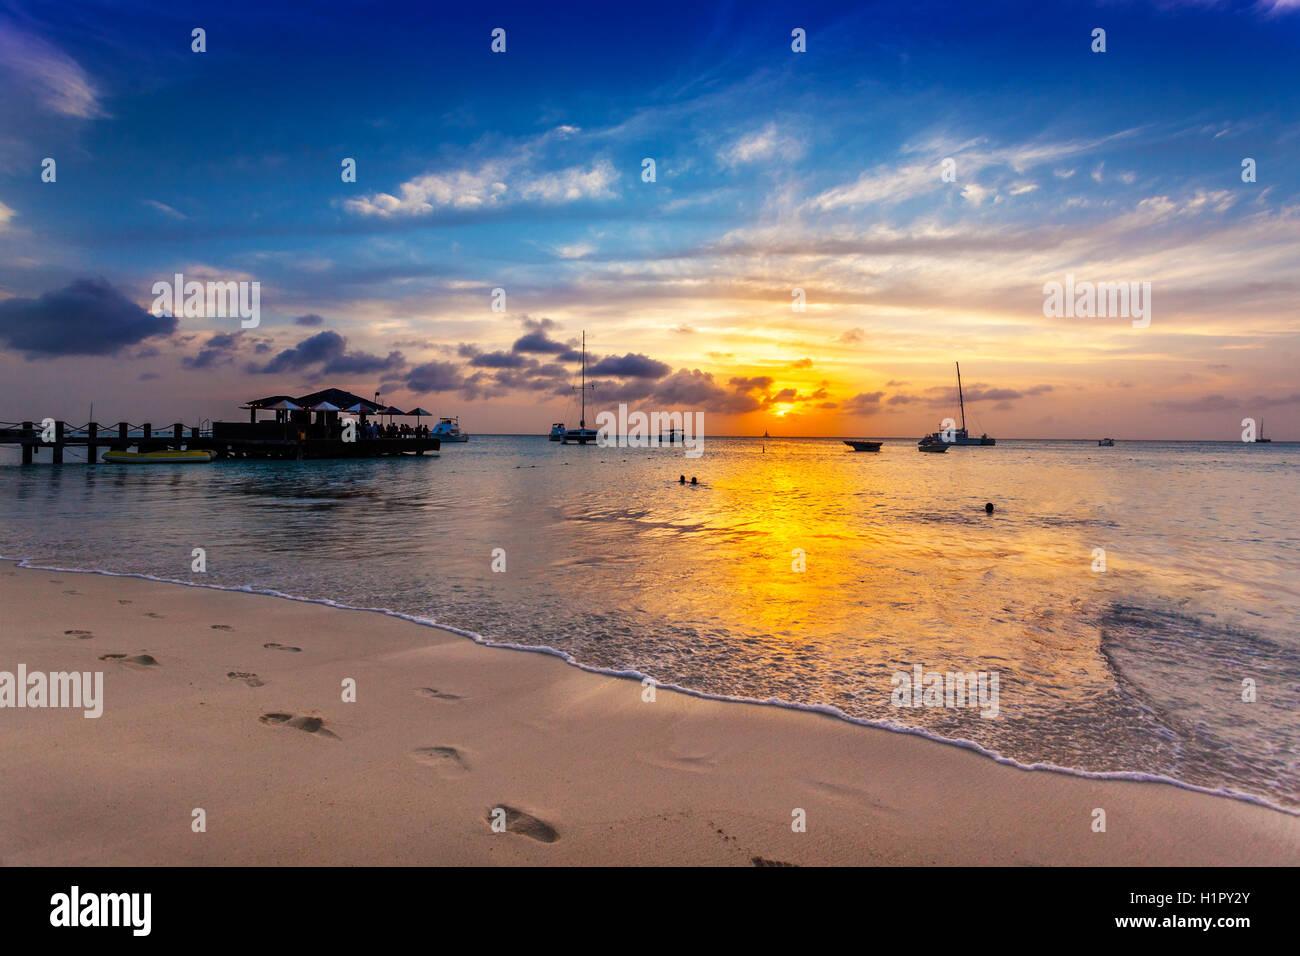 Sun goes down over Palm Beach, Aruba - Stock Image